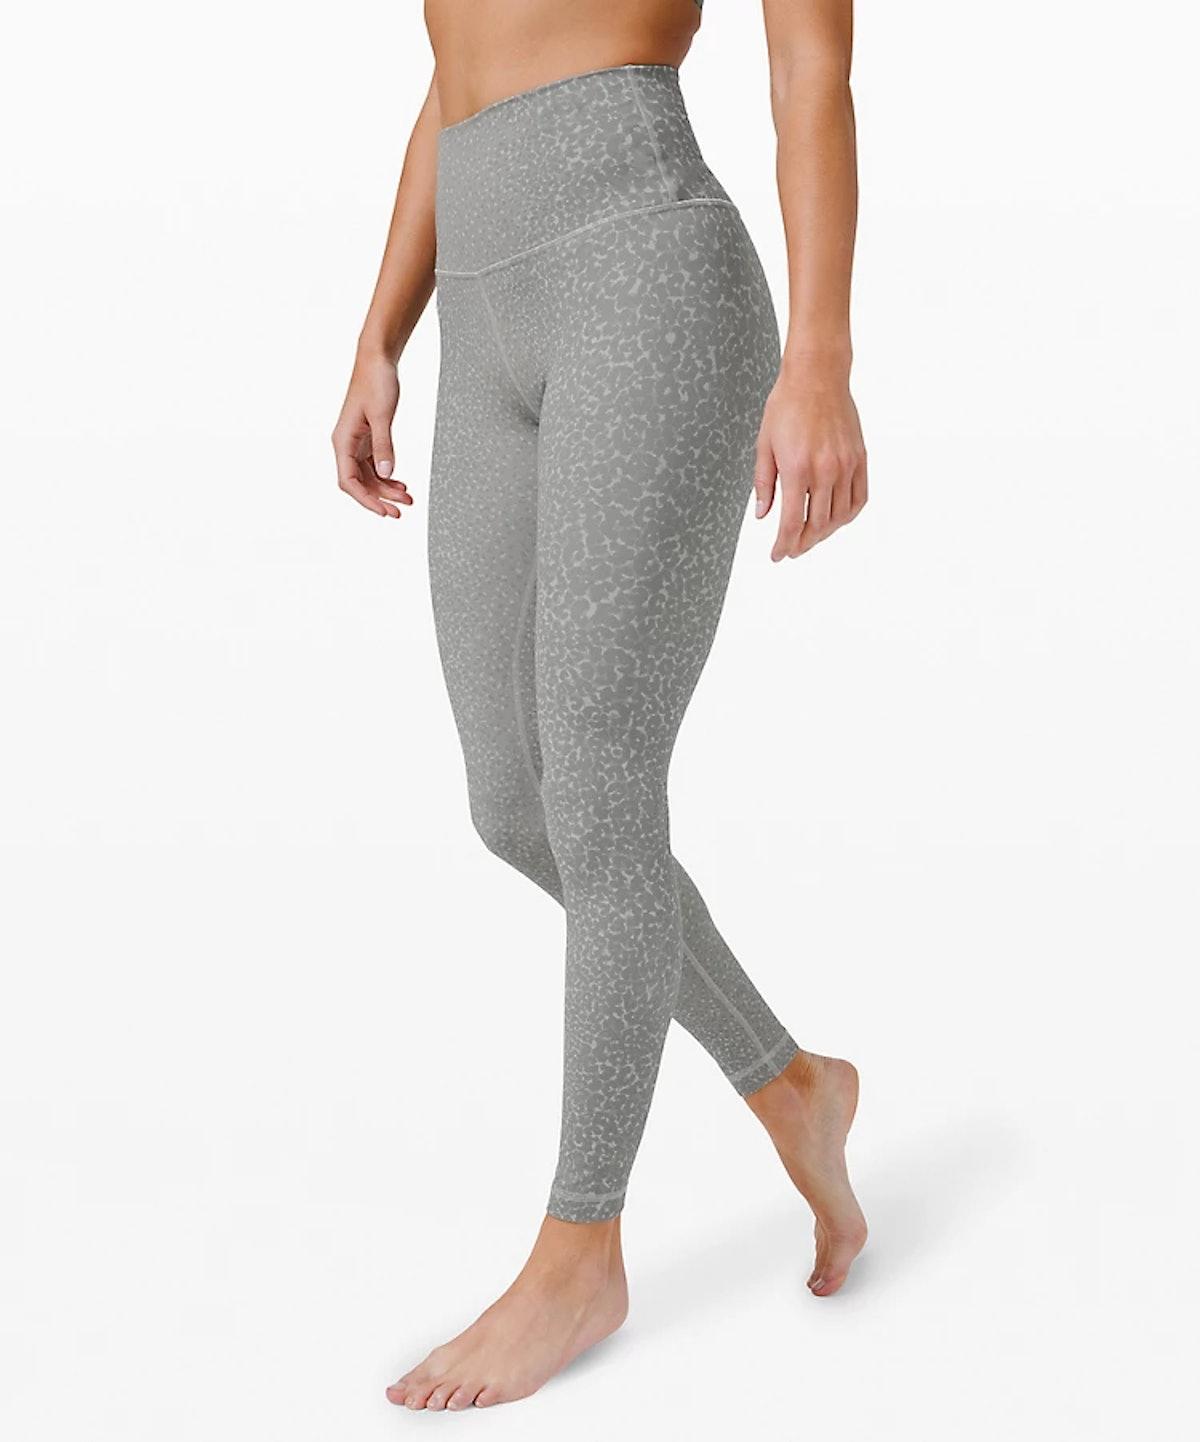 "Align Pant 28"" Camo Engineered Print"